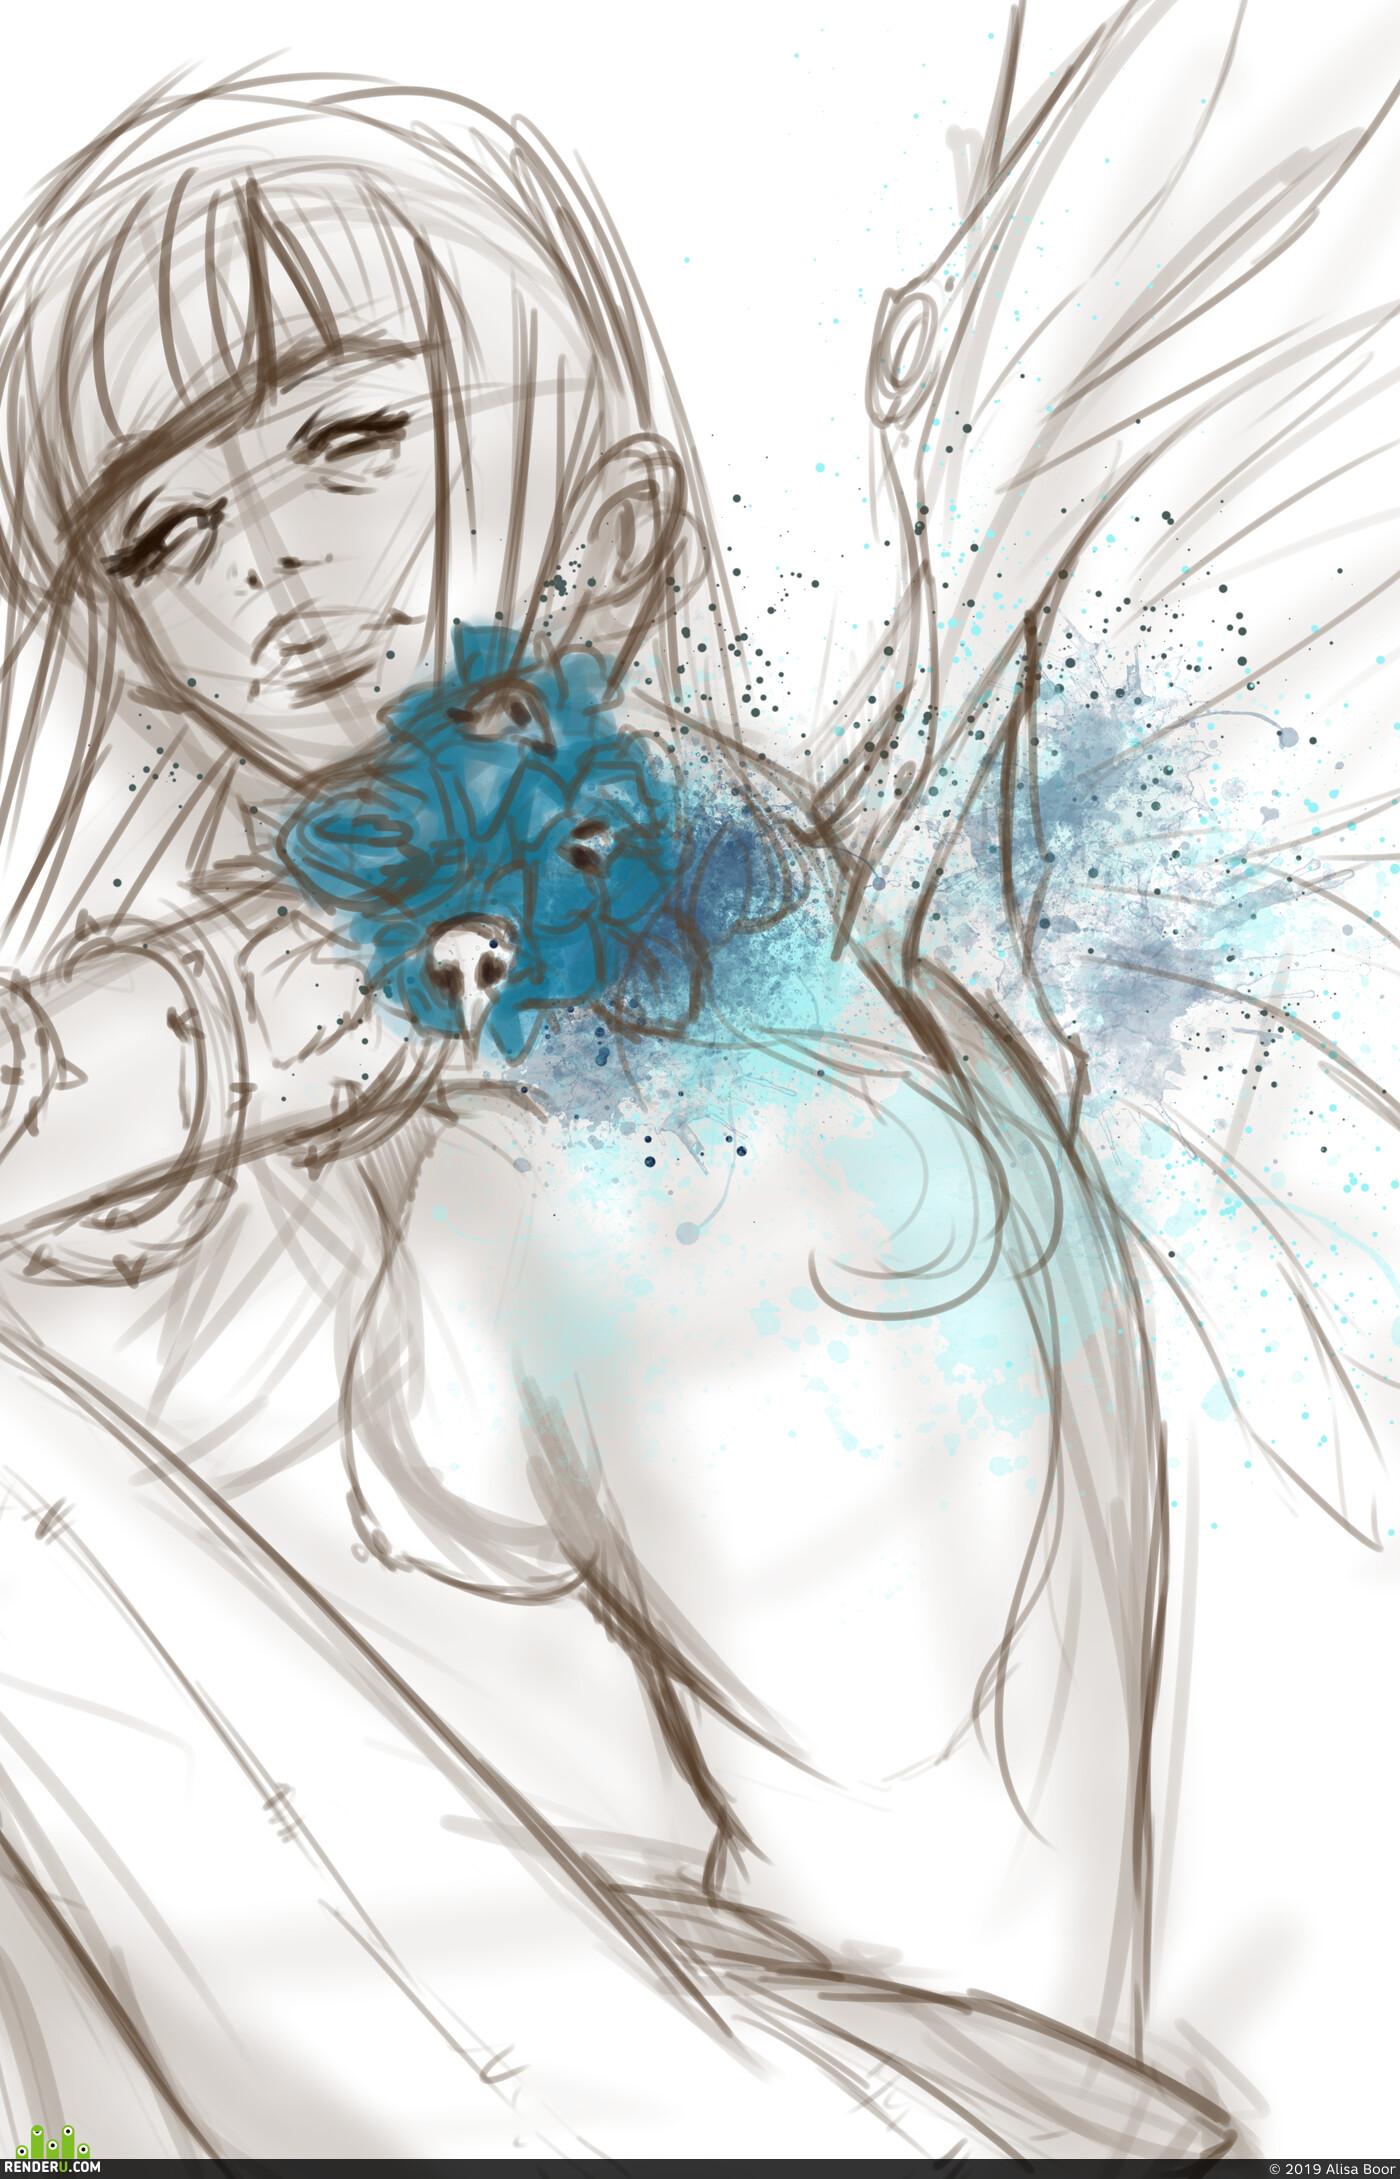 sketching, Sketches, digital sketching, everyday sketch, creature, creatures, girl, girls, girlportrait, girlpainting